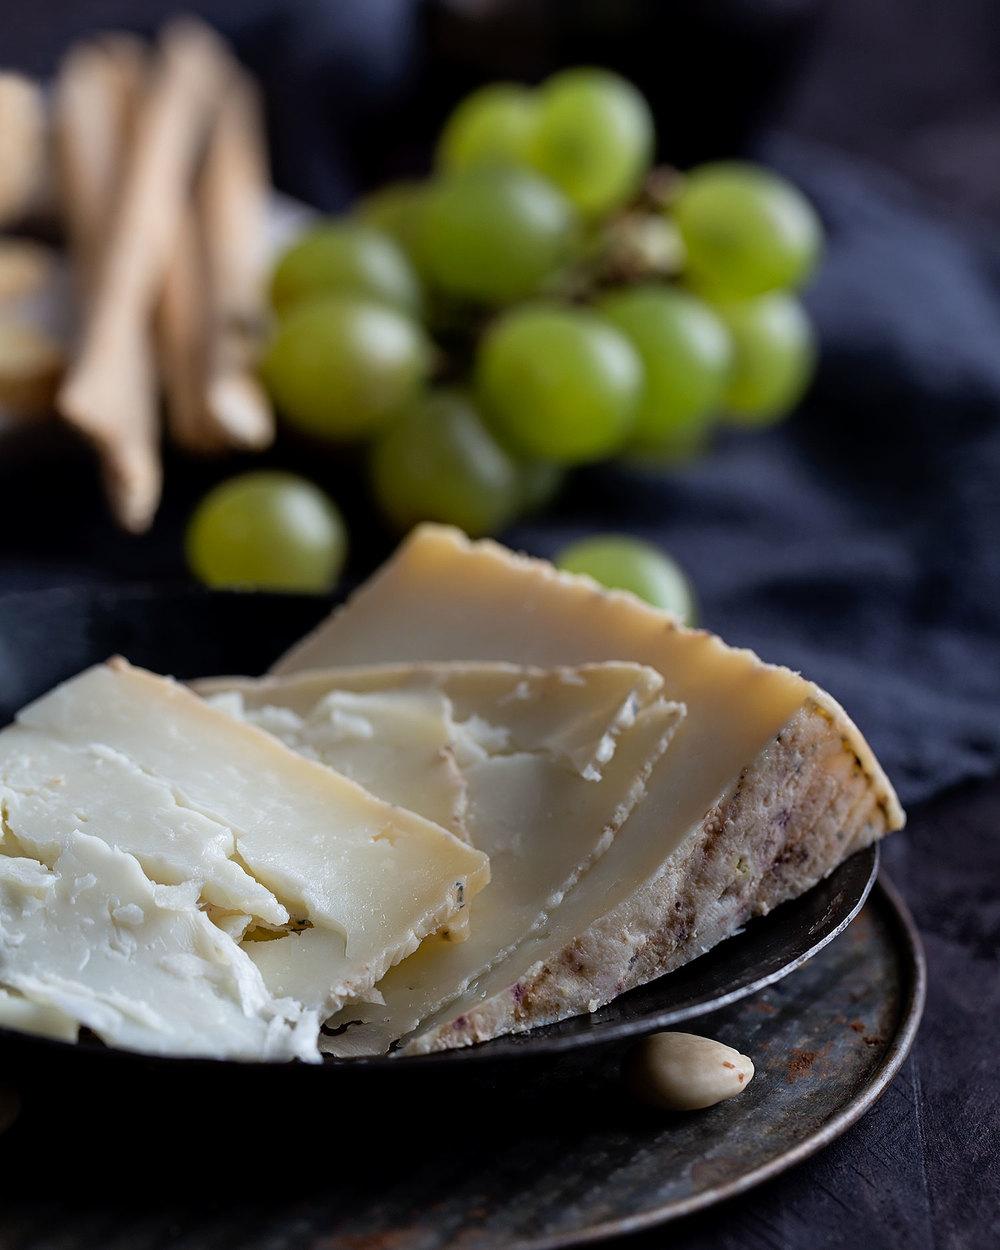 corina-landa-food-photography-fotografia-gastronomica-61.jpg